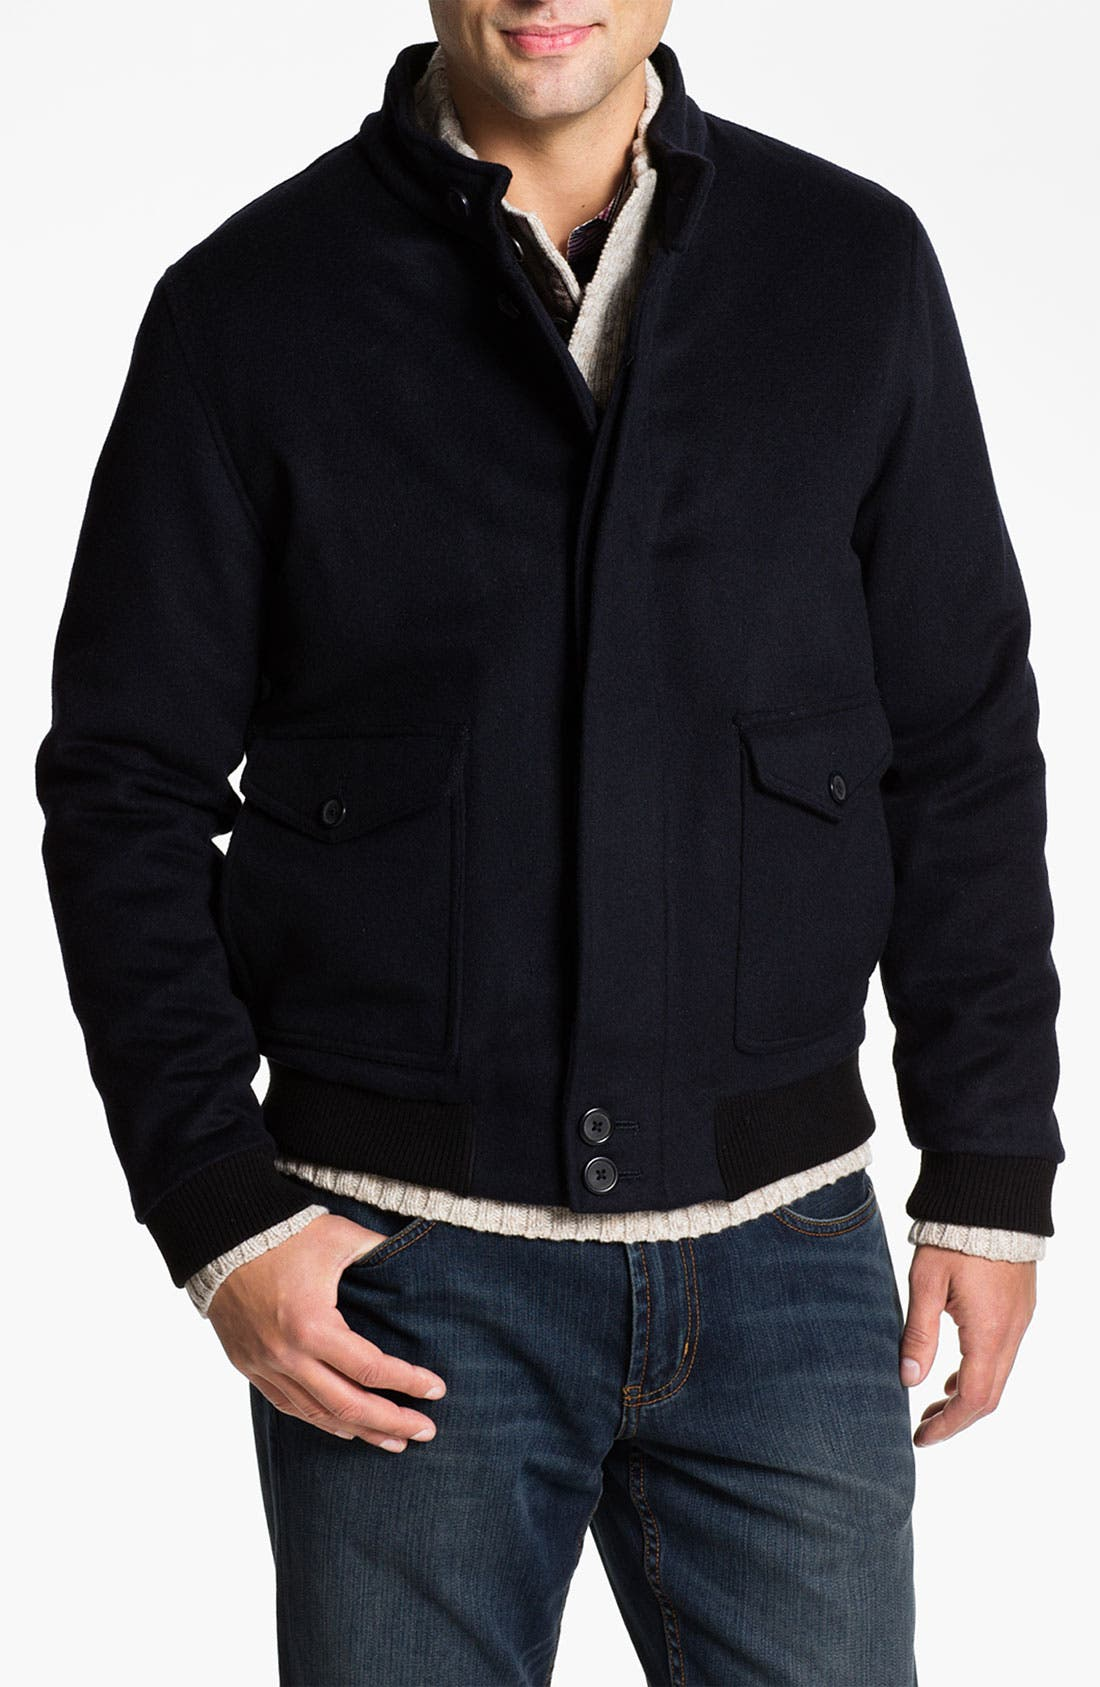 Main Image - Hart Schaffner Marx Wool & Cashmere Blouson Jacket